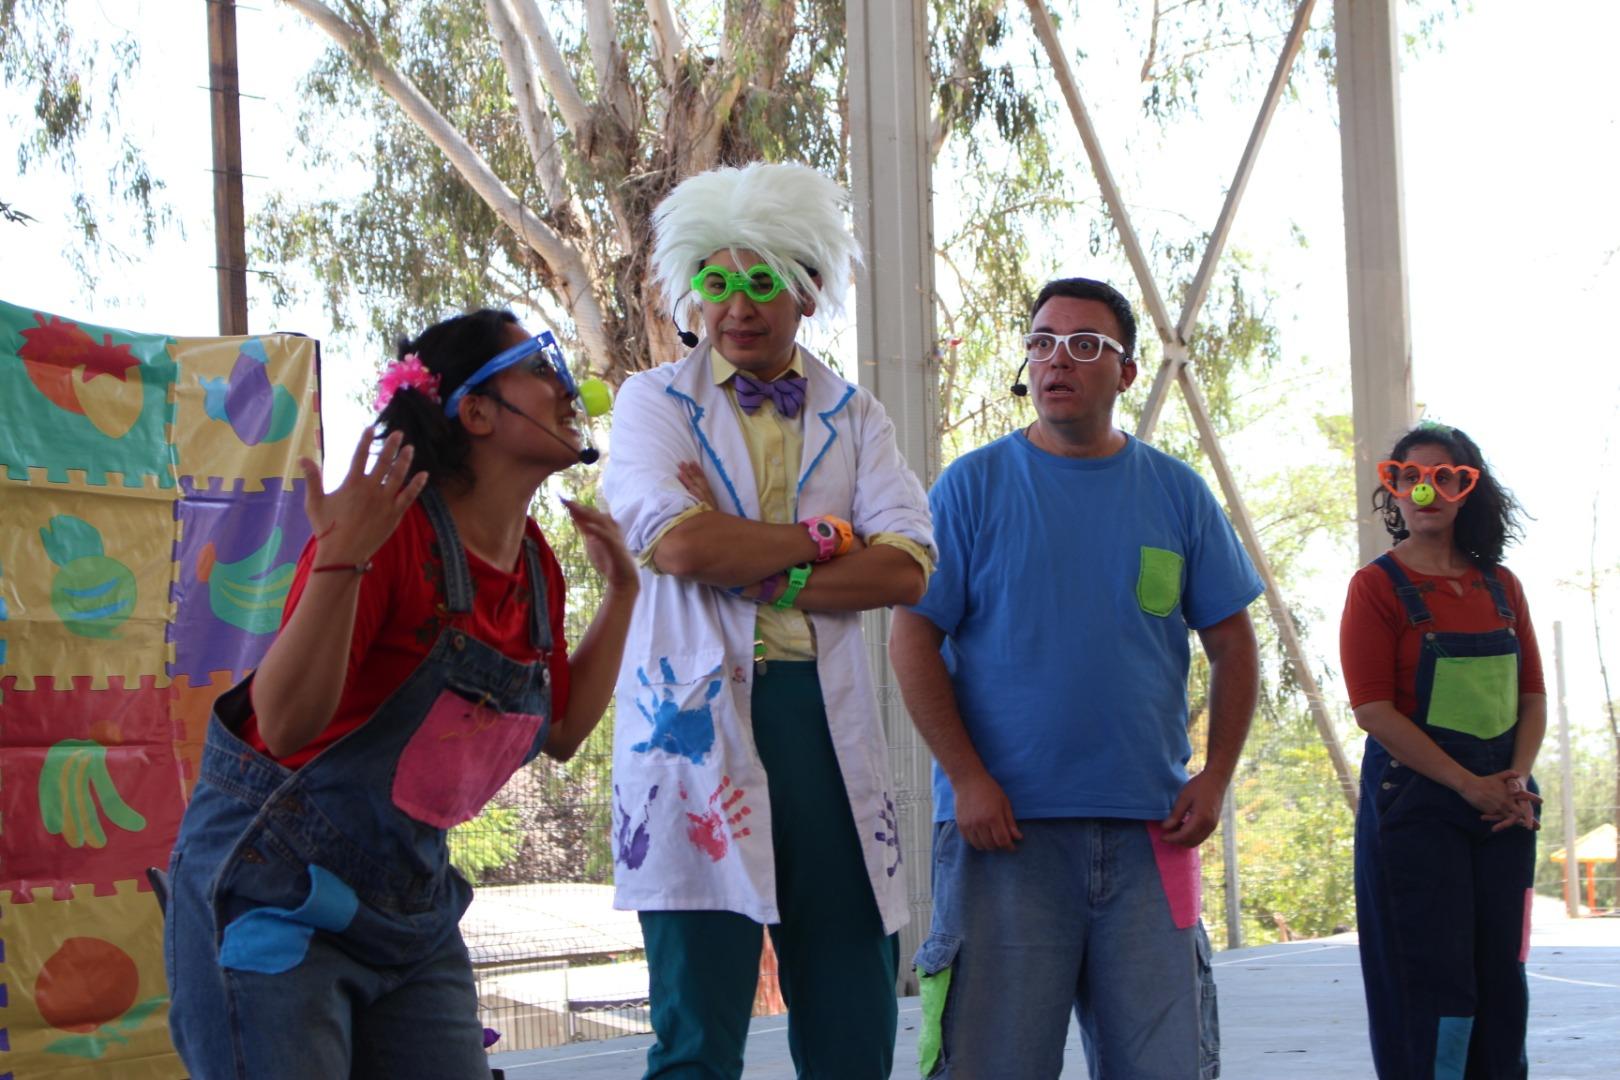 Obra de teatro que enseña sobre hábitos alimenticios se presentó en escuela Las Canteras